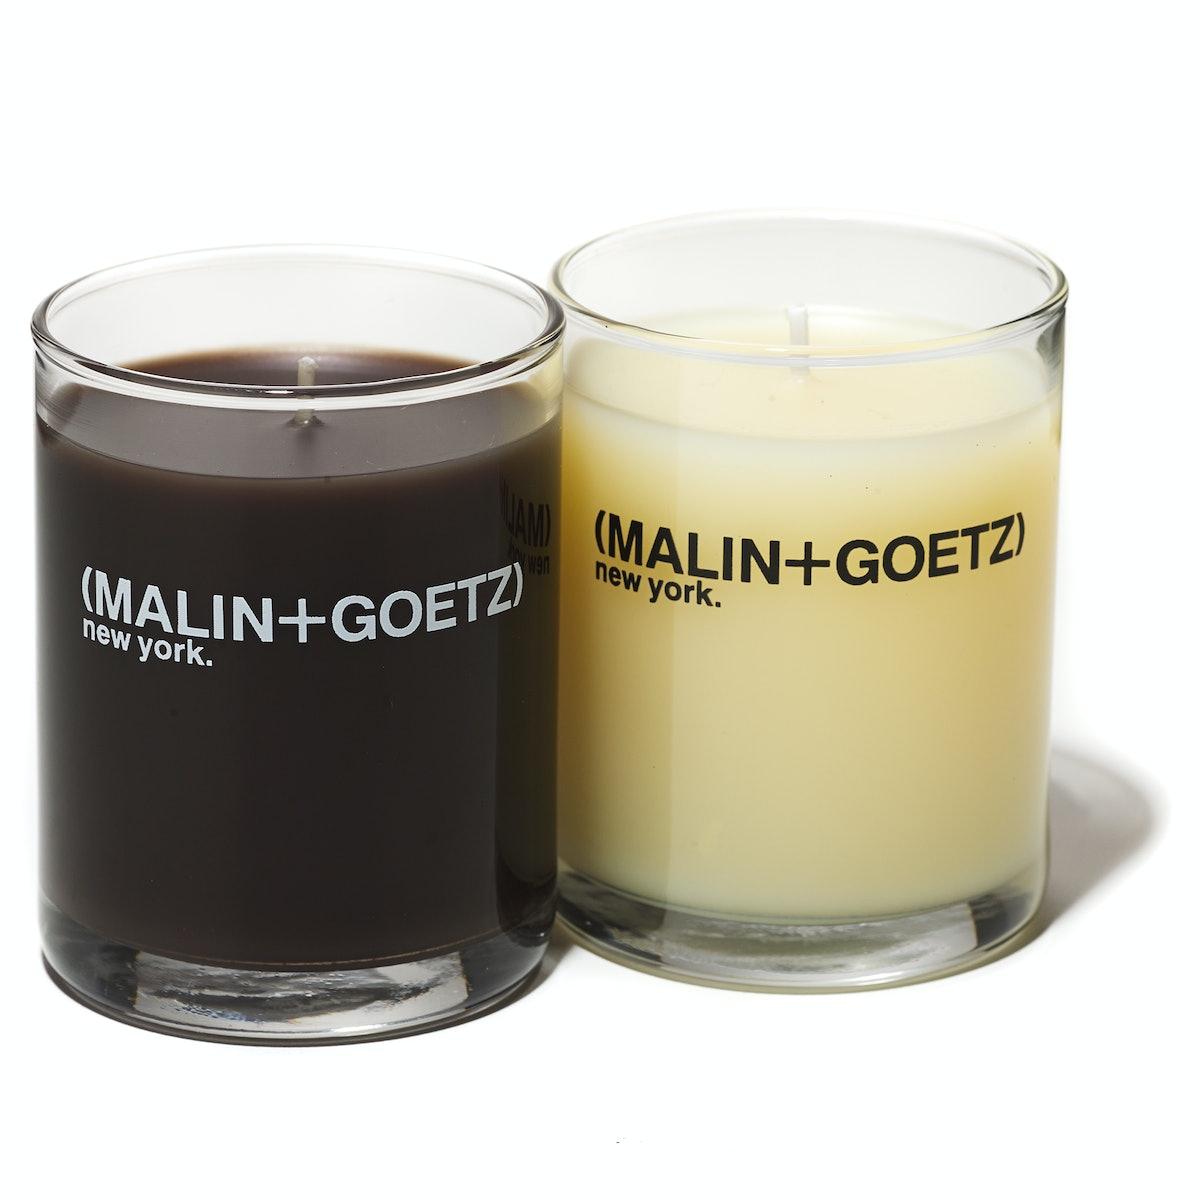 Malin + Goetz votives